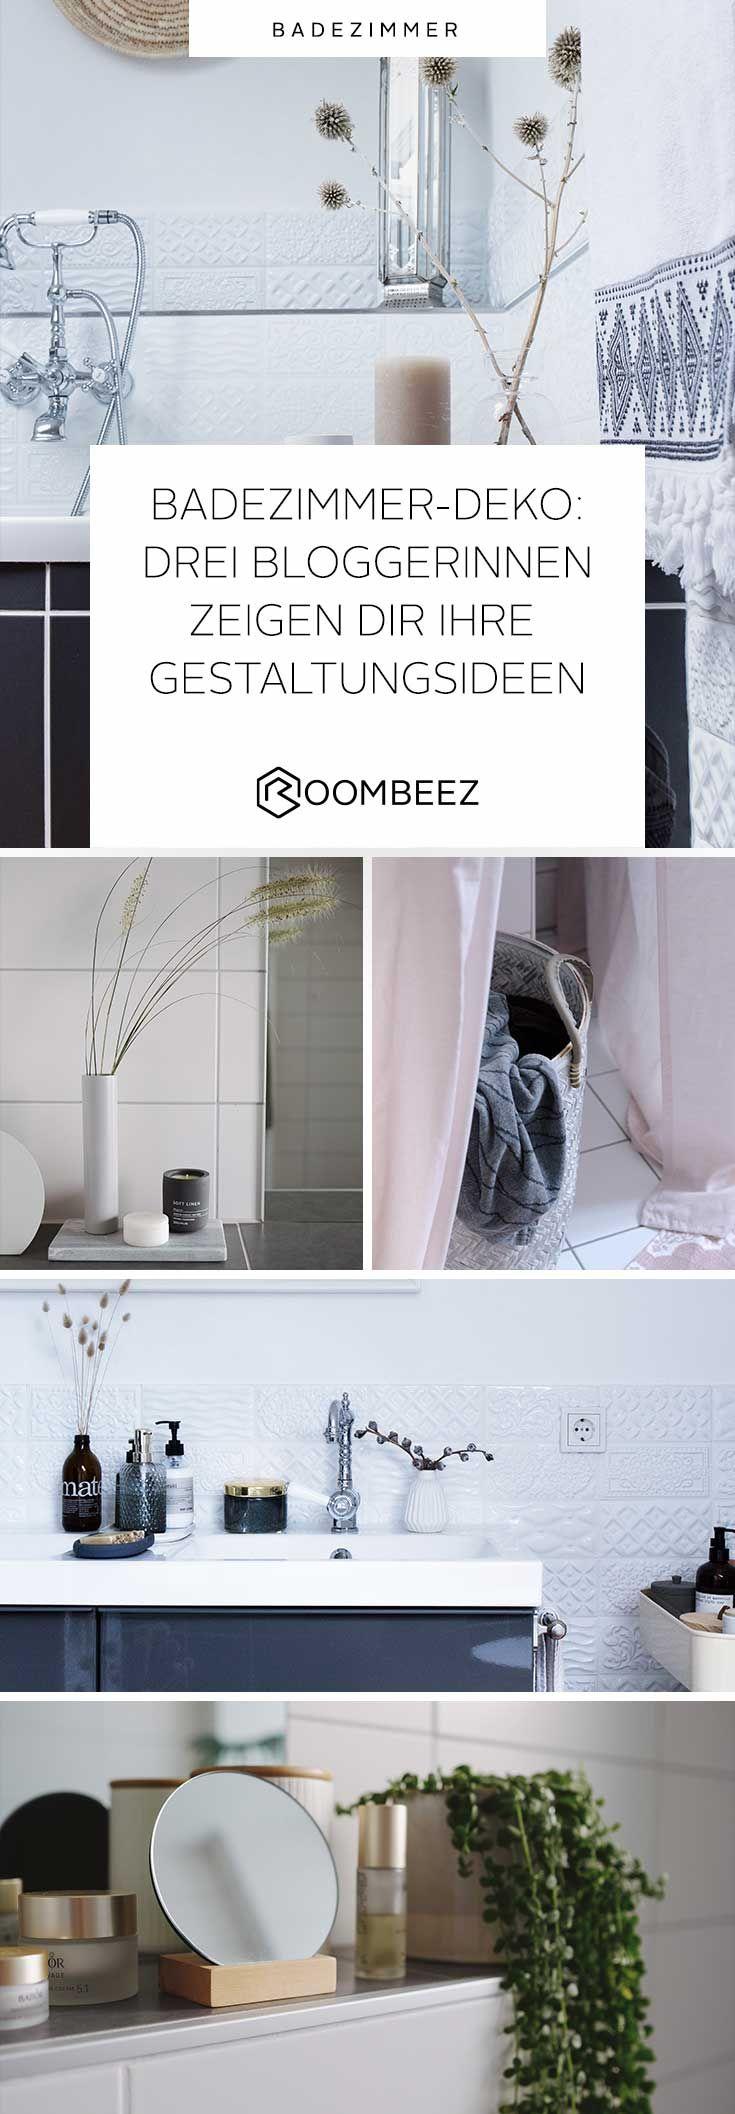 Badezimmer ideen große fliesen badezimmerdeko   bloggerinnen geben tipps  badezimmer